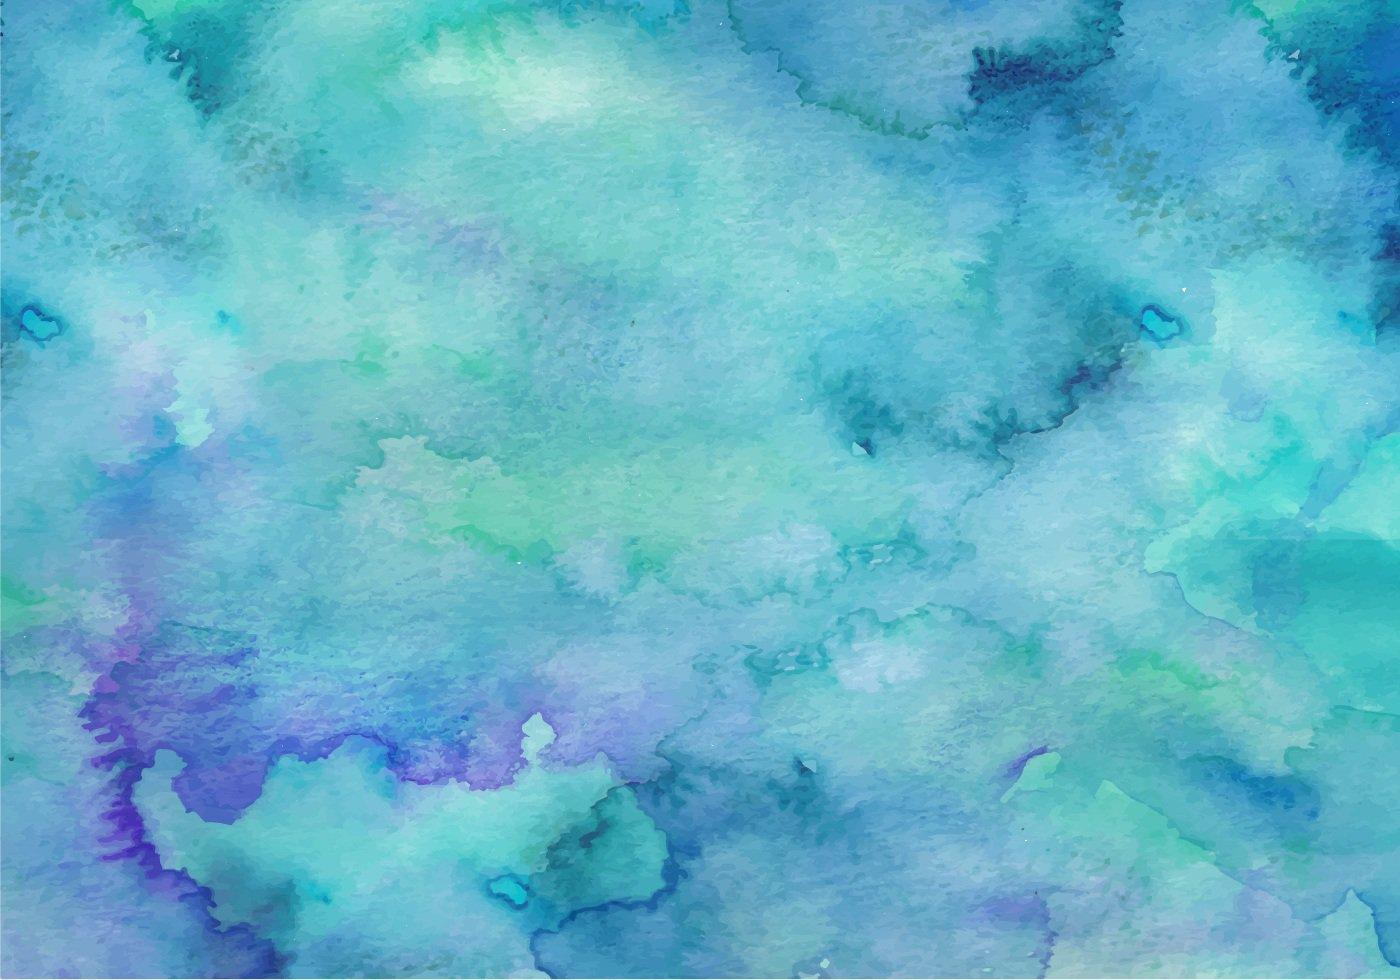 watercolor background wallpaper